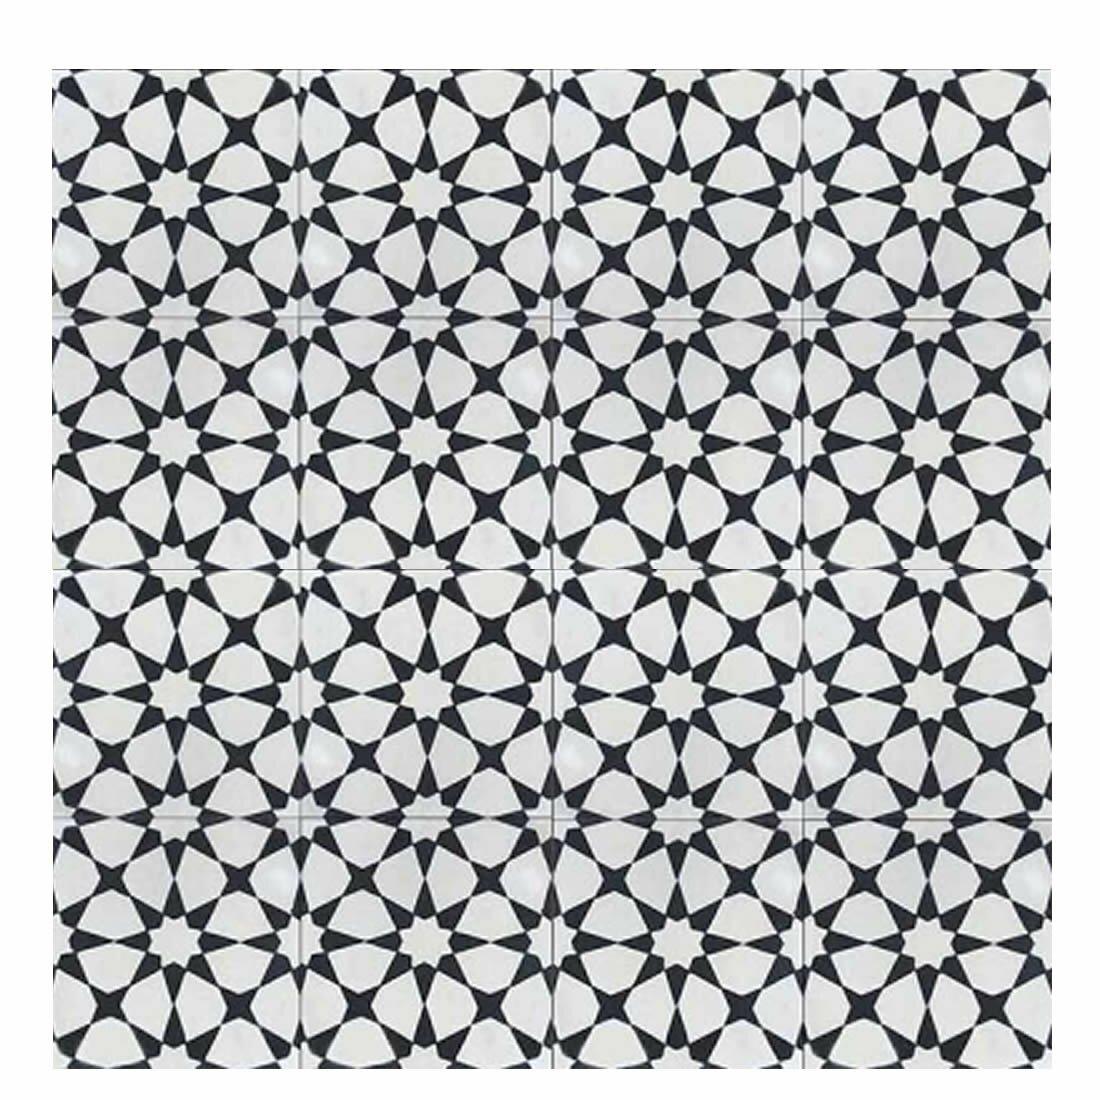 Springtime Wreaths Moroccan Mosaic Tile House Medina 8 Quot X 8 Quot Cement Tile In